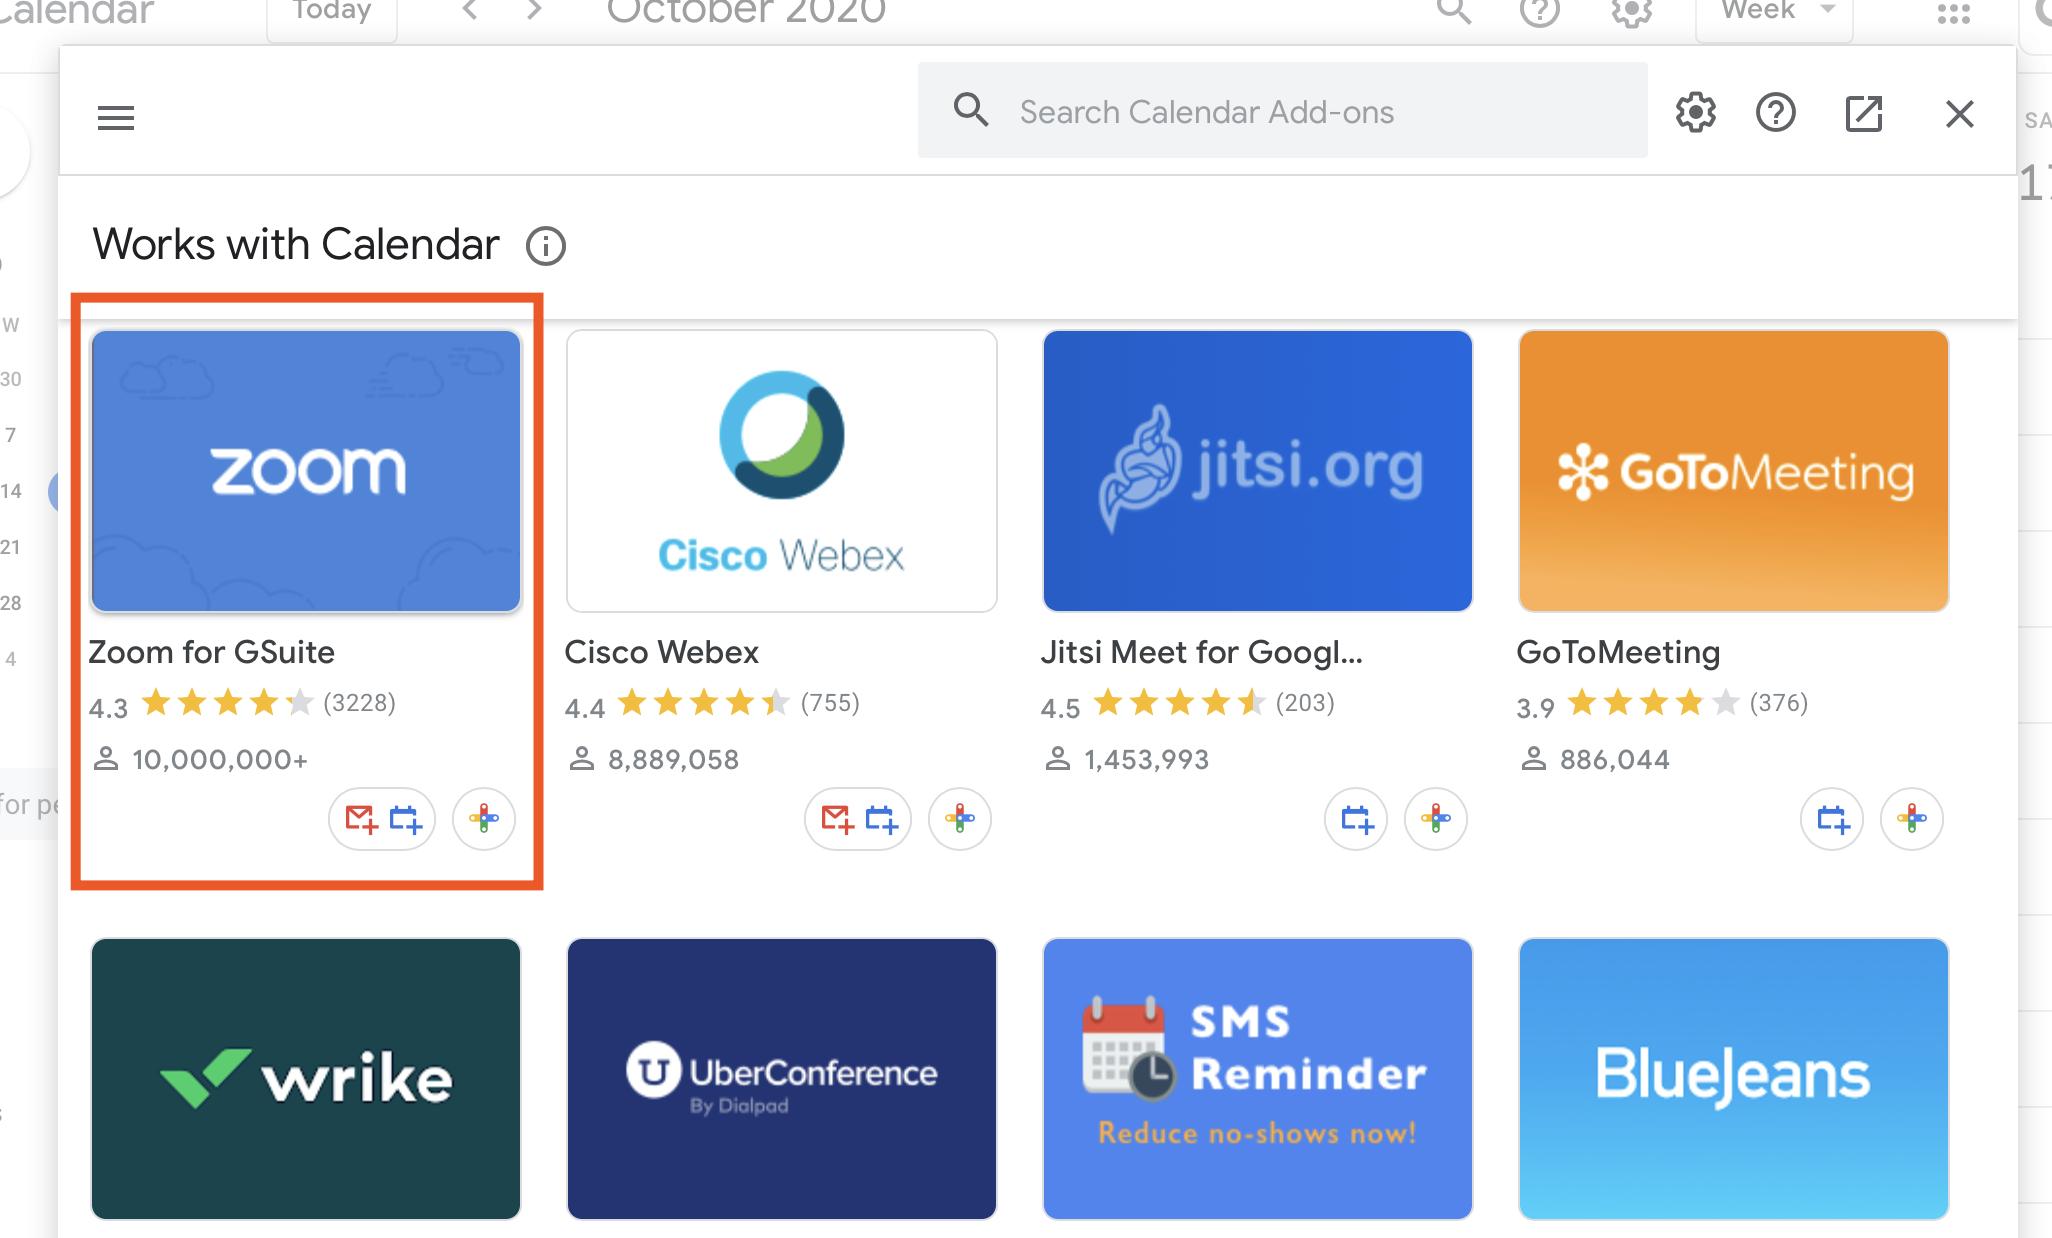 Install Zoom in Google Calendar